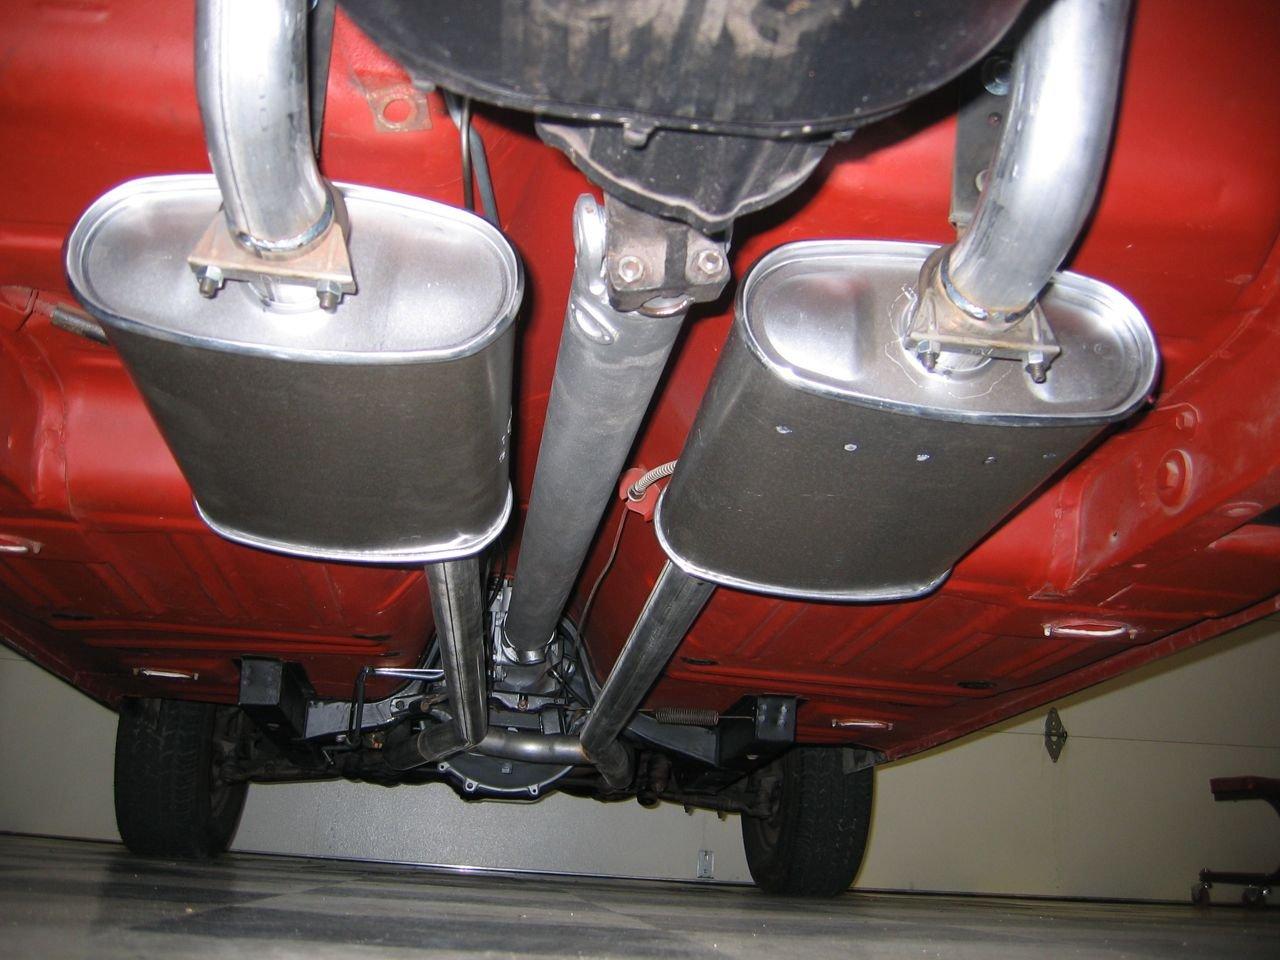 65 mustang parking brake pictures to pin on pinterest